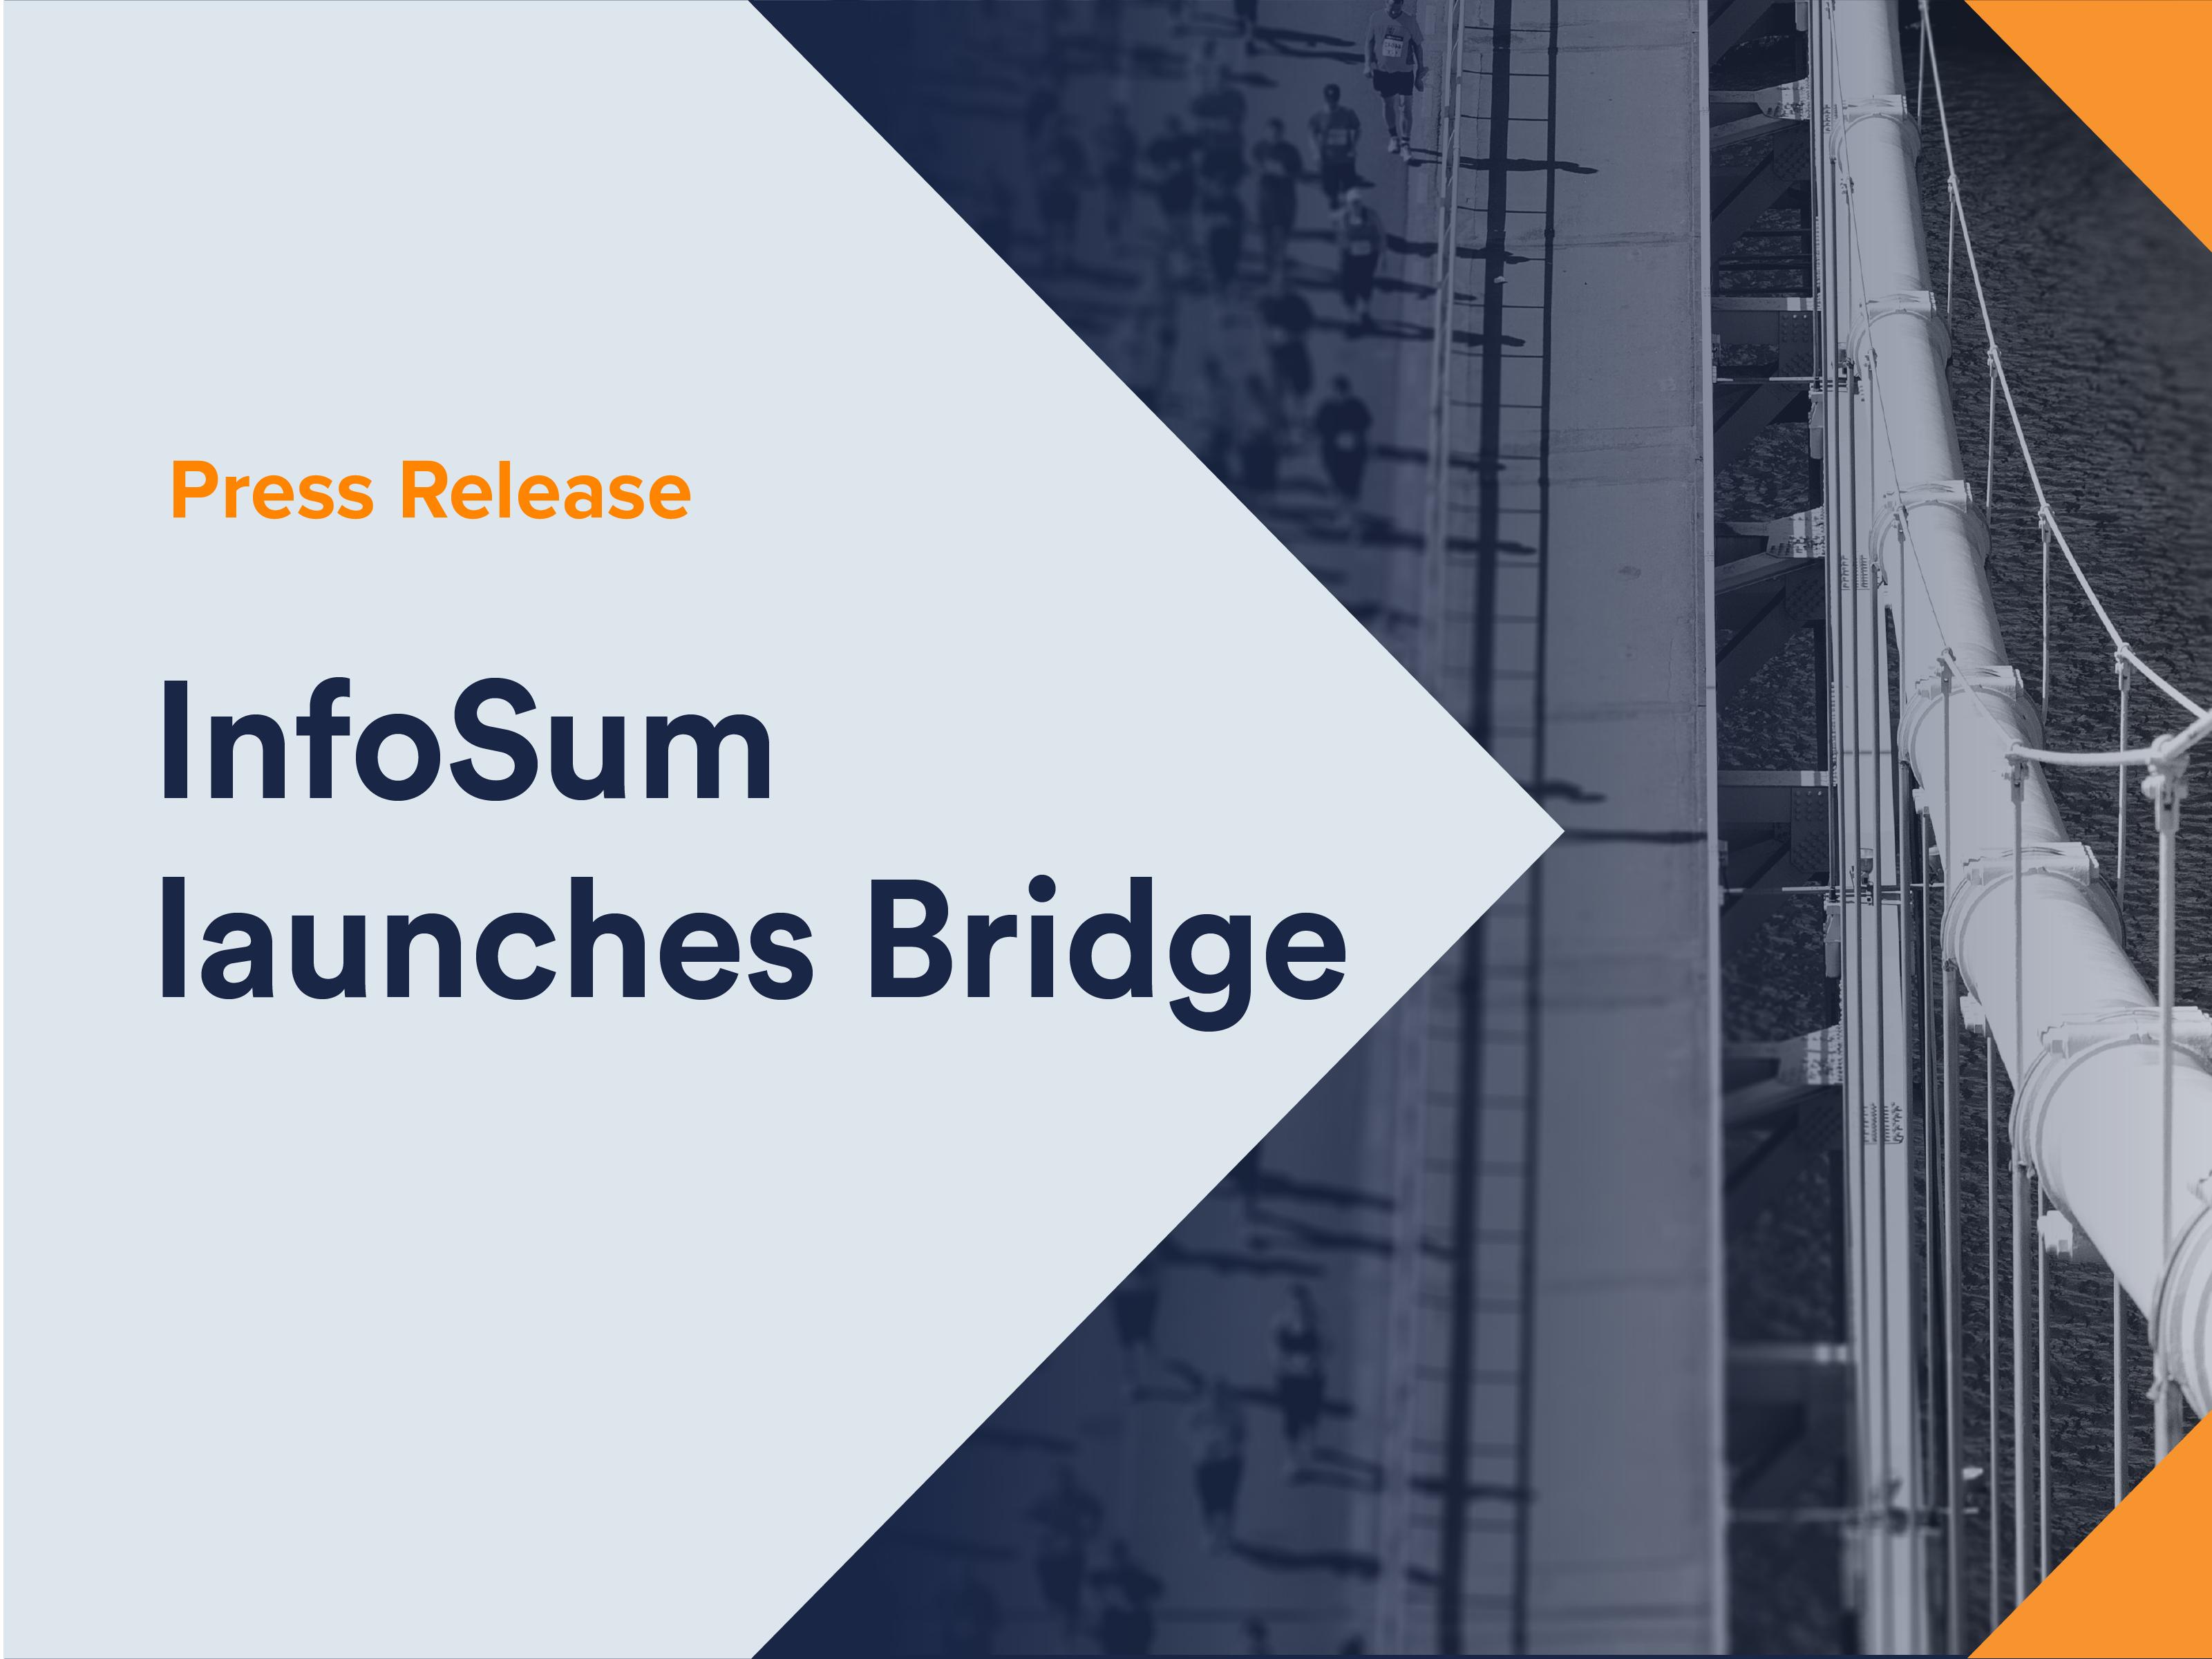 InfoSum launches 'InfoSum Bridge', a new privacy-centric solution